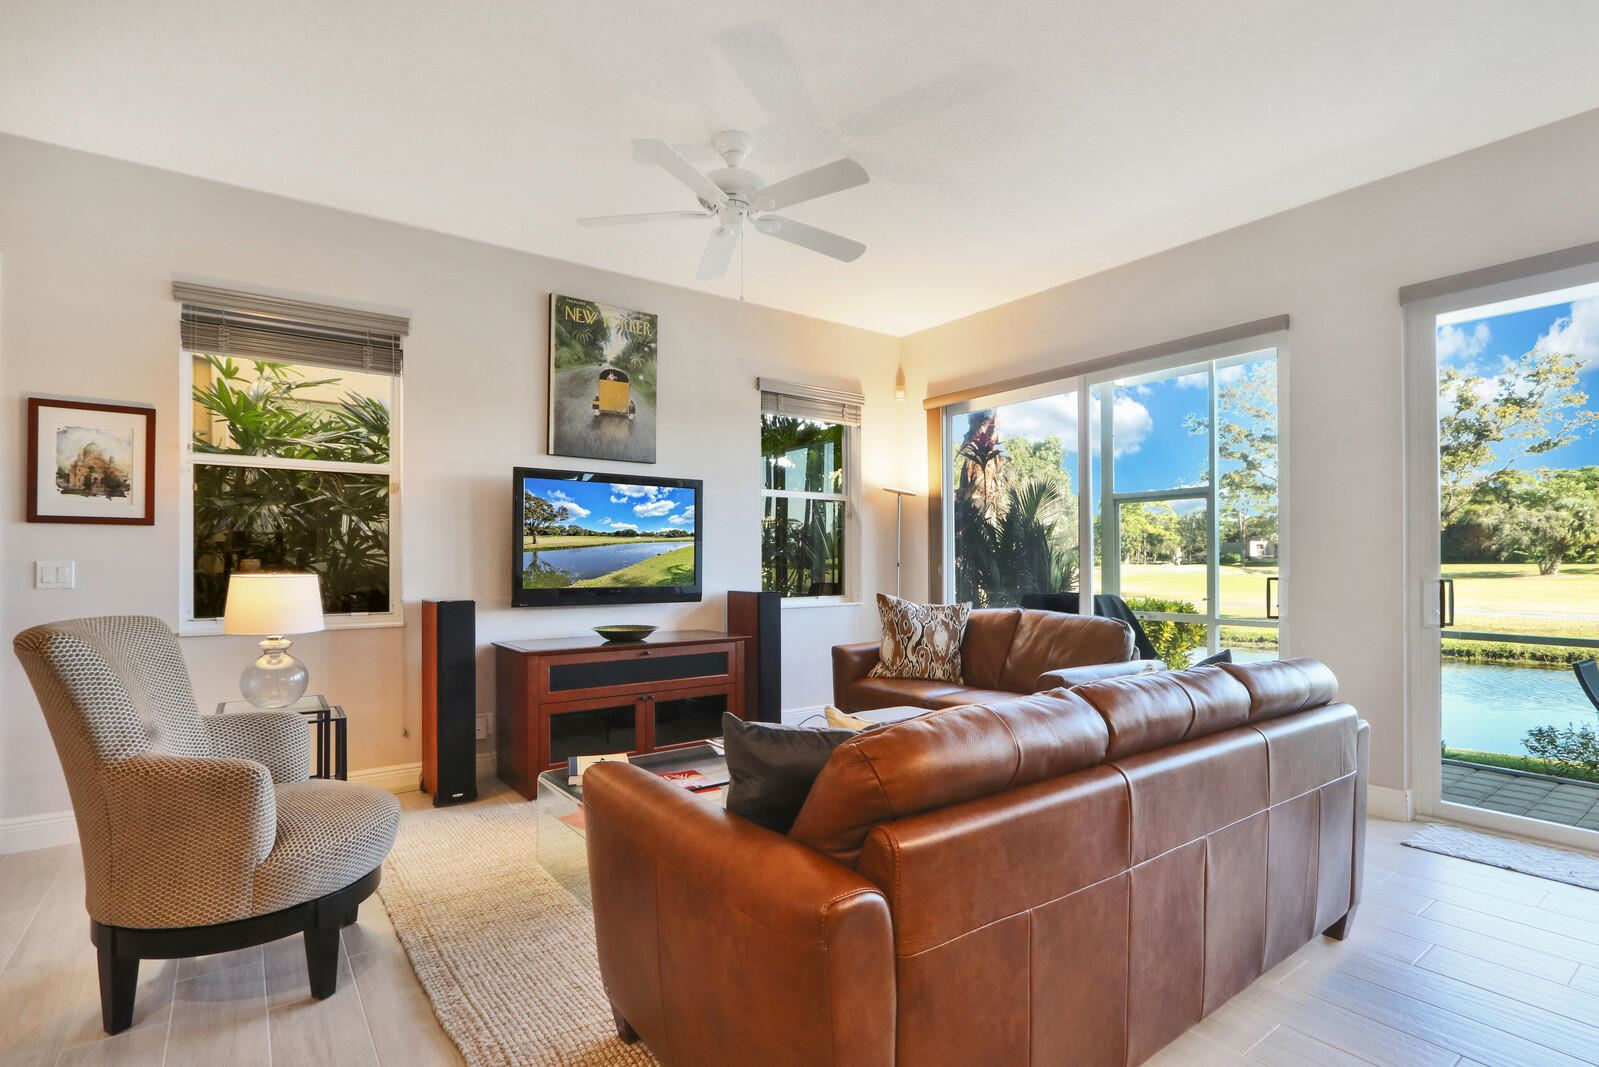 Photo of 105 Resort Lane, Palm Beach Gardens, FL 33418 (MLS # RX-10679056)